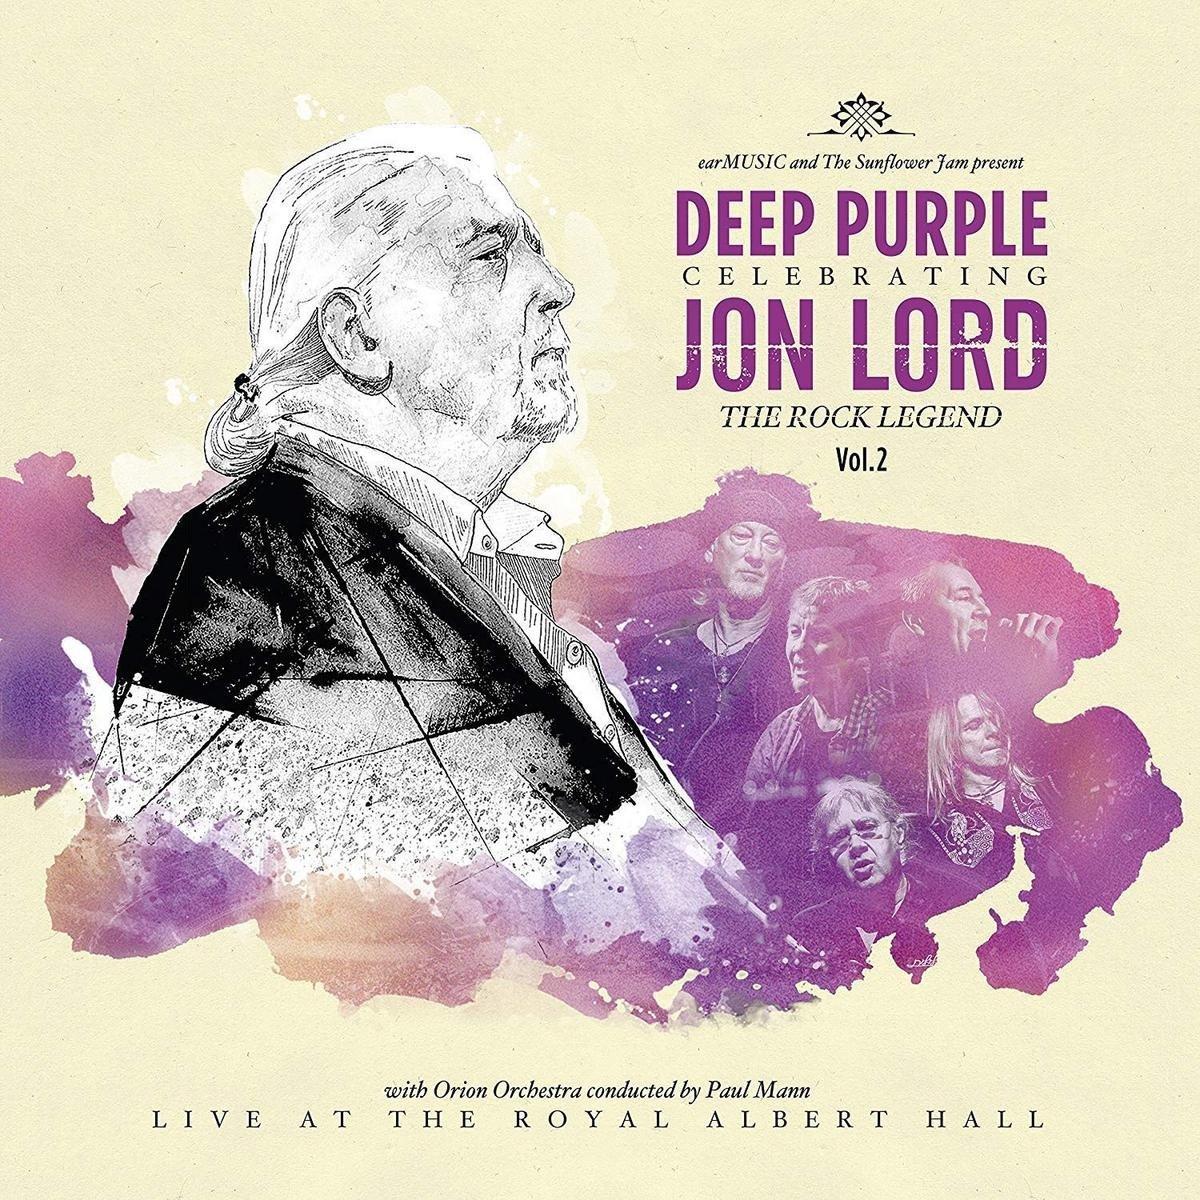 Vinilo : JON LORD, DEEP PURPLE & FRIENDS - Celebrating Jon Lord: The Rock Legend Vol 2 (United Kingdom - Import, 2PC)